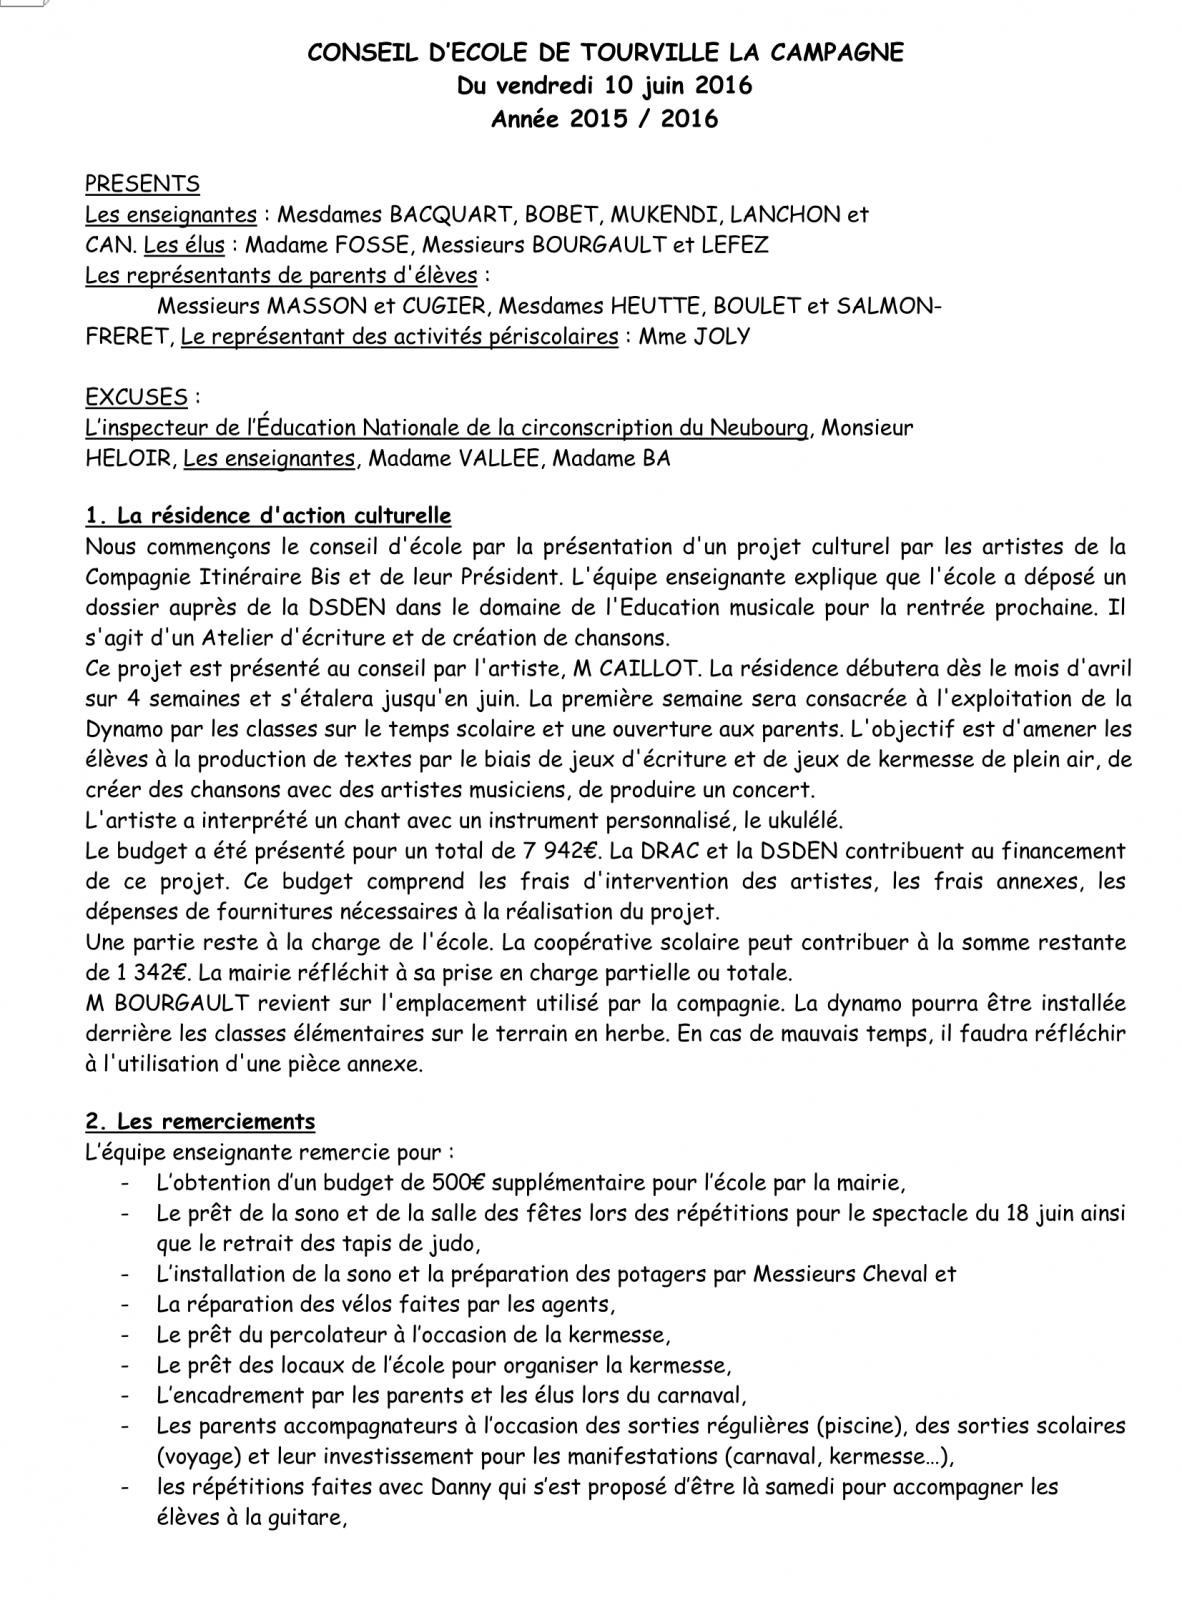 pv-conseil-dcole-3-pdf-modifi-1